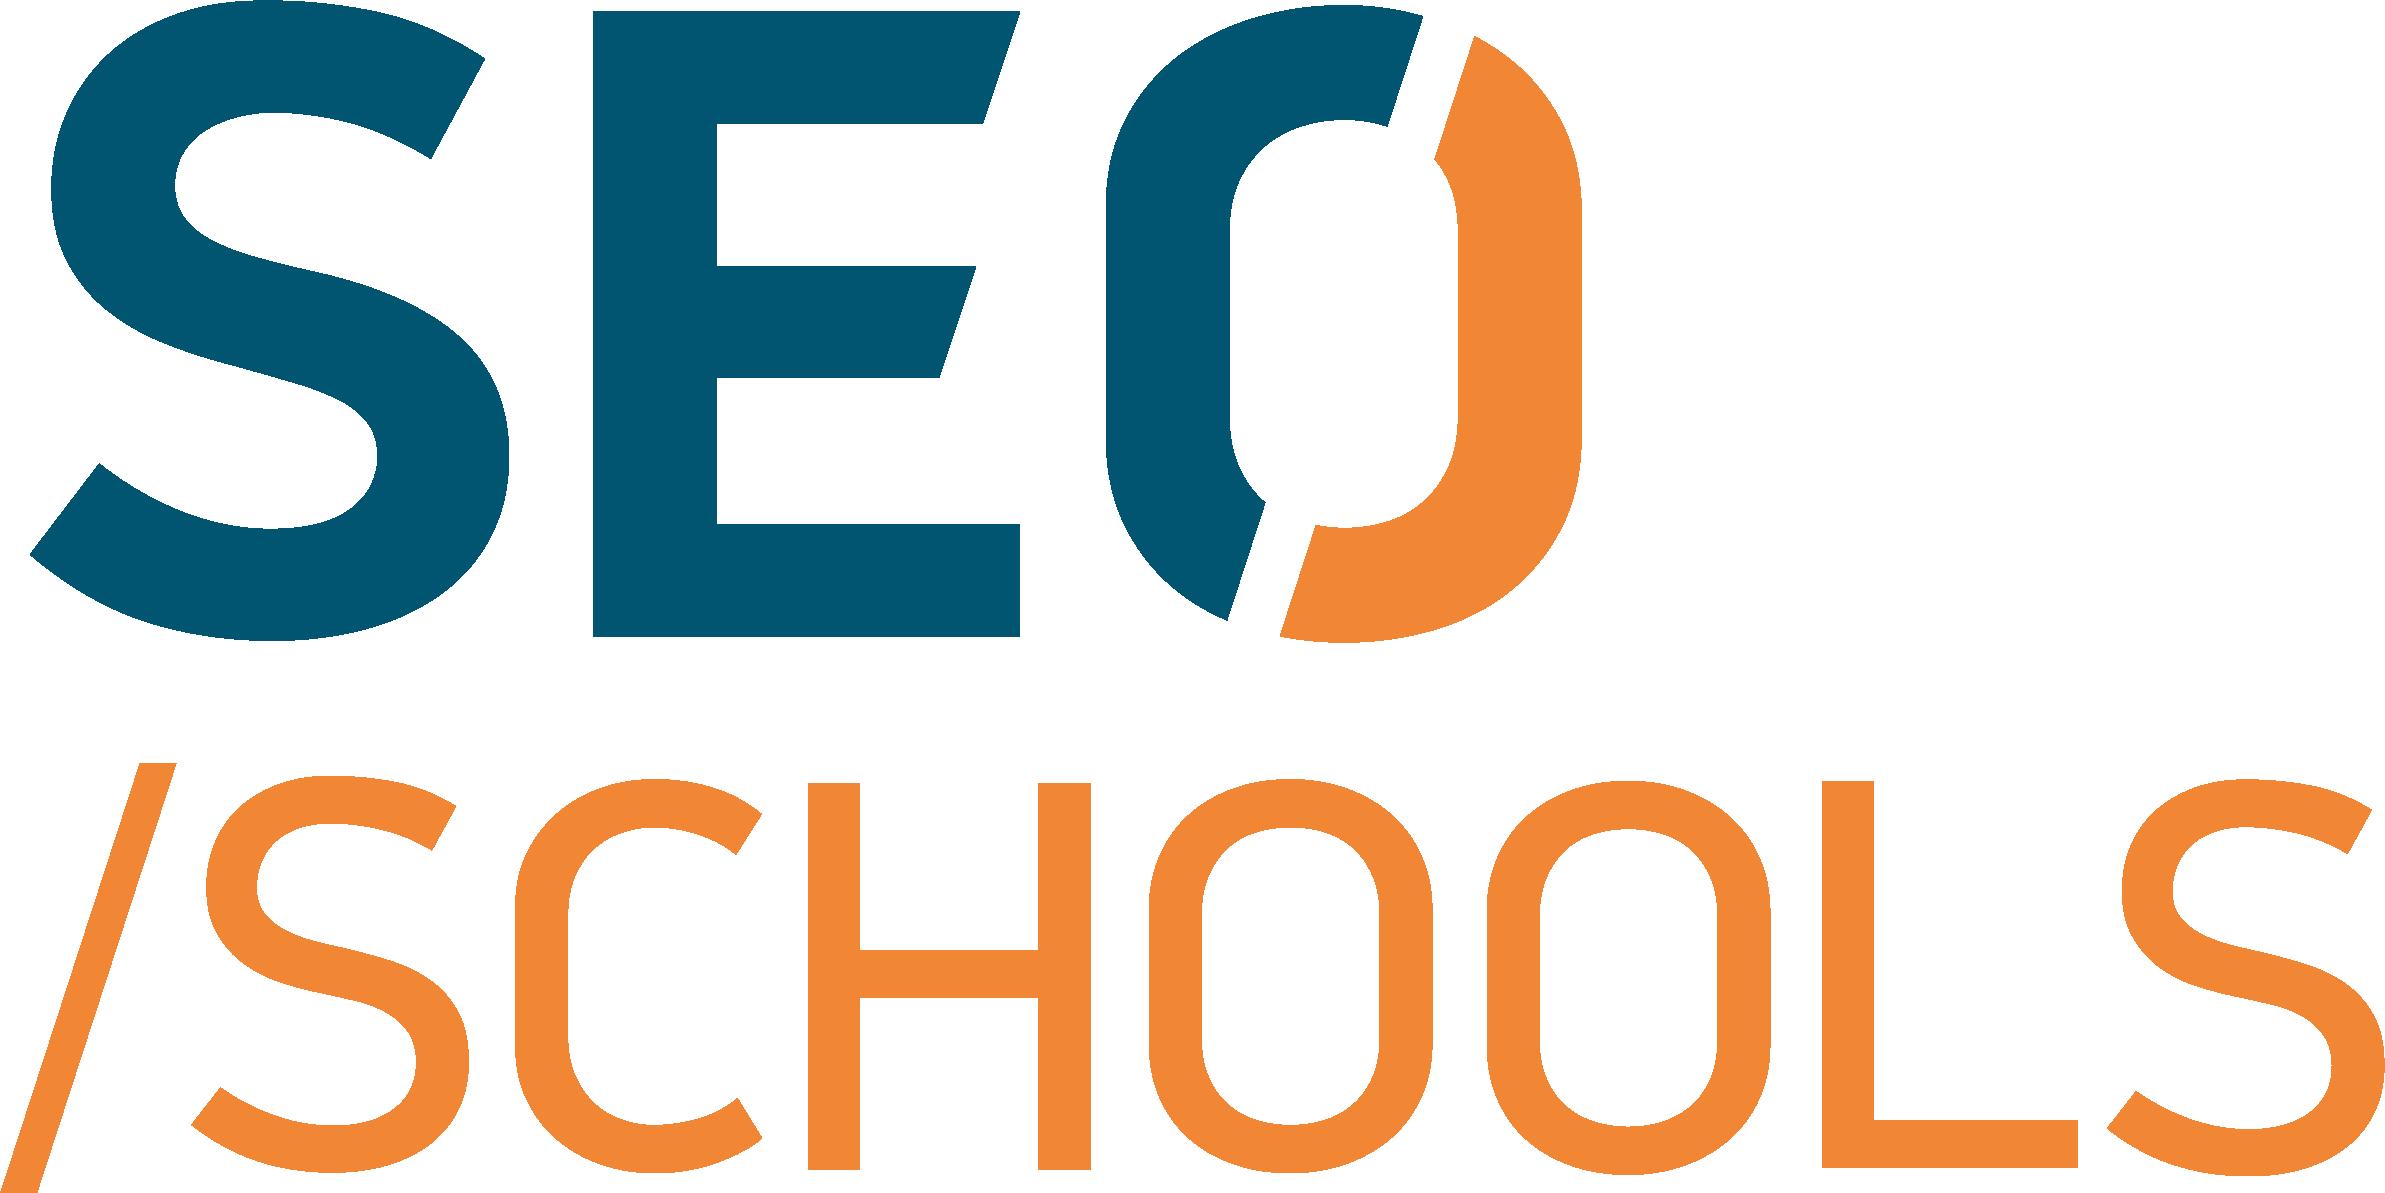 SEO Schools logo image